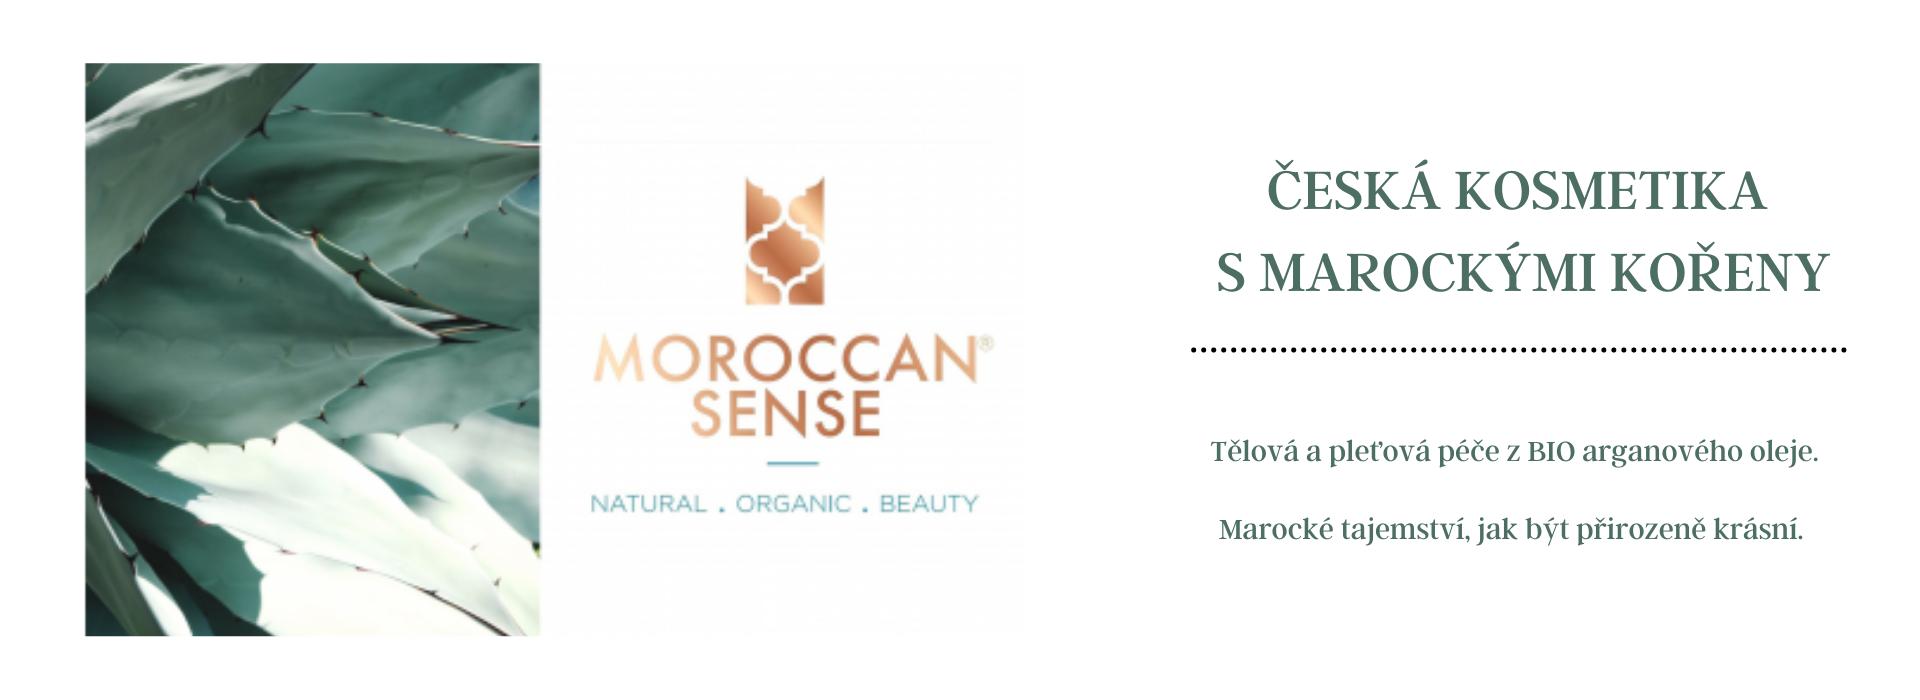 Moroccan Sense - novinka